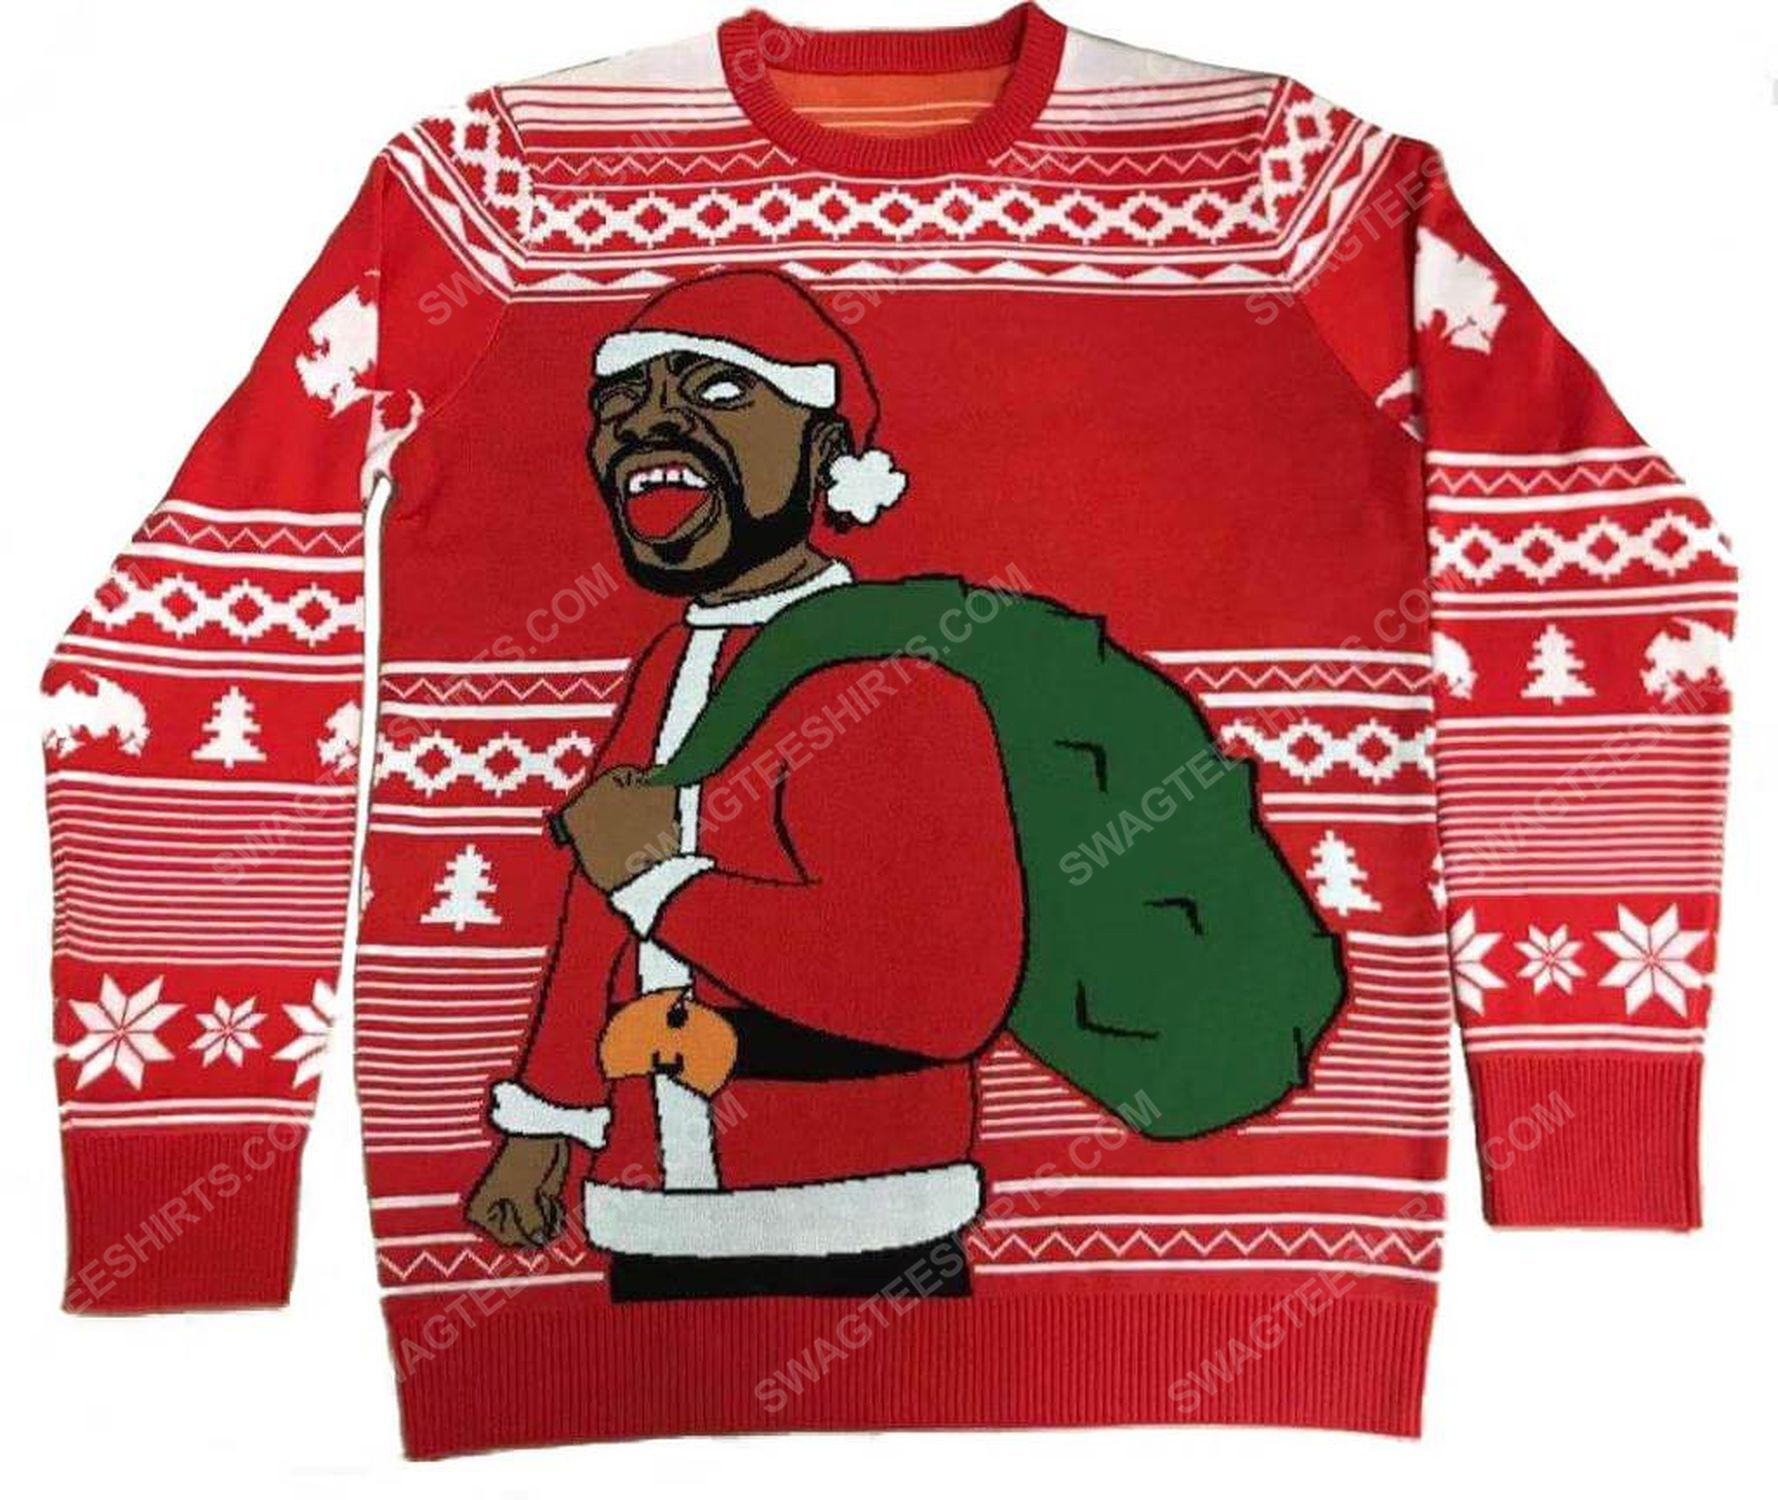 Method man and redman full print ugly christmas sweater 3